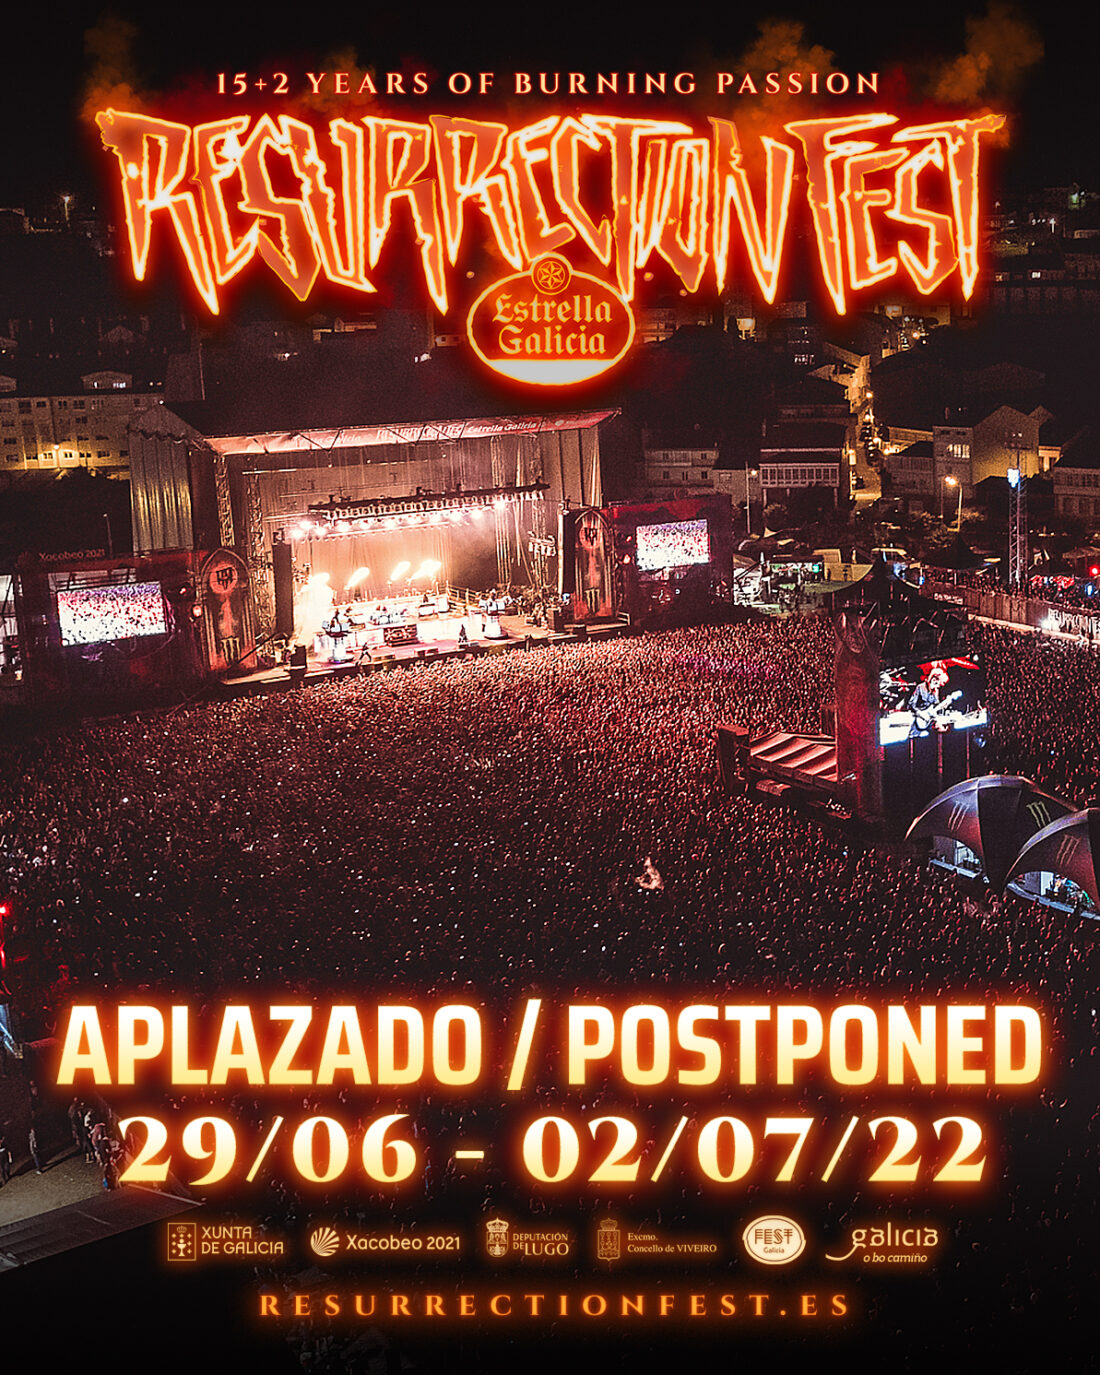 Official statement: Resurrection Fest Estrella Galicia is postponed to 2022